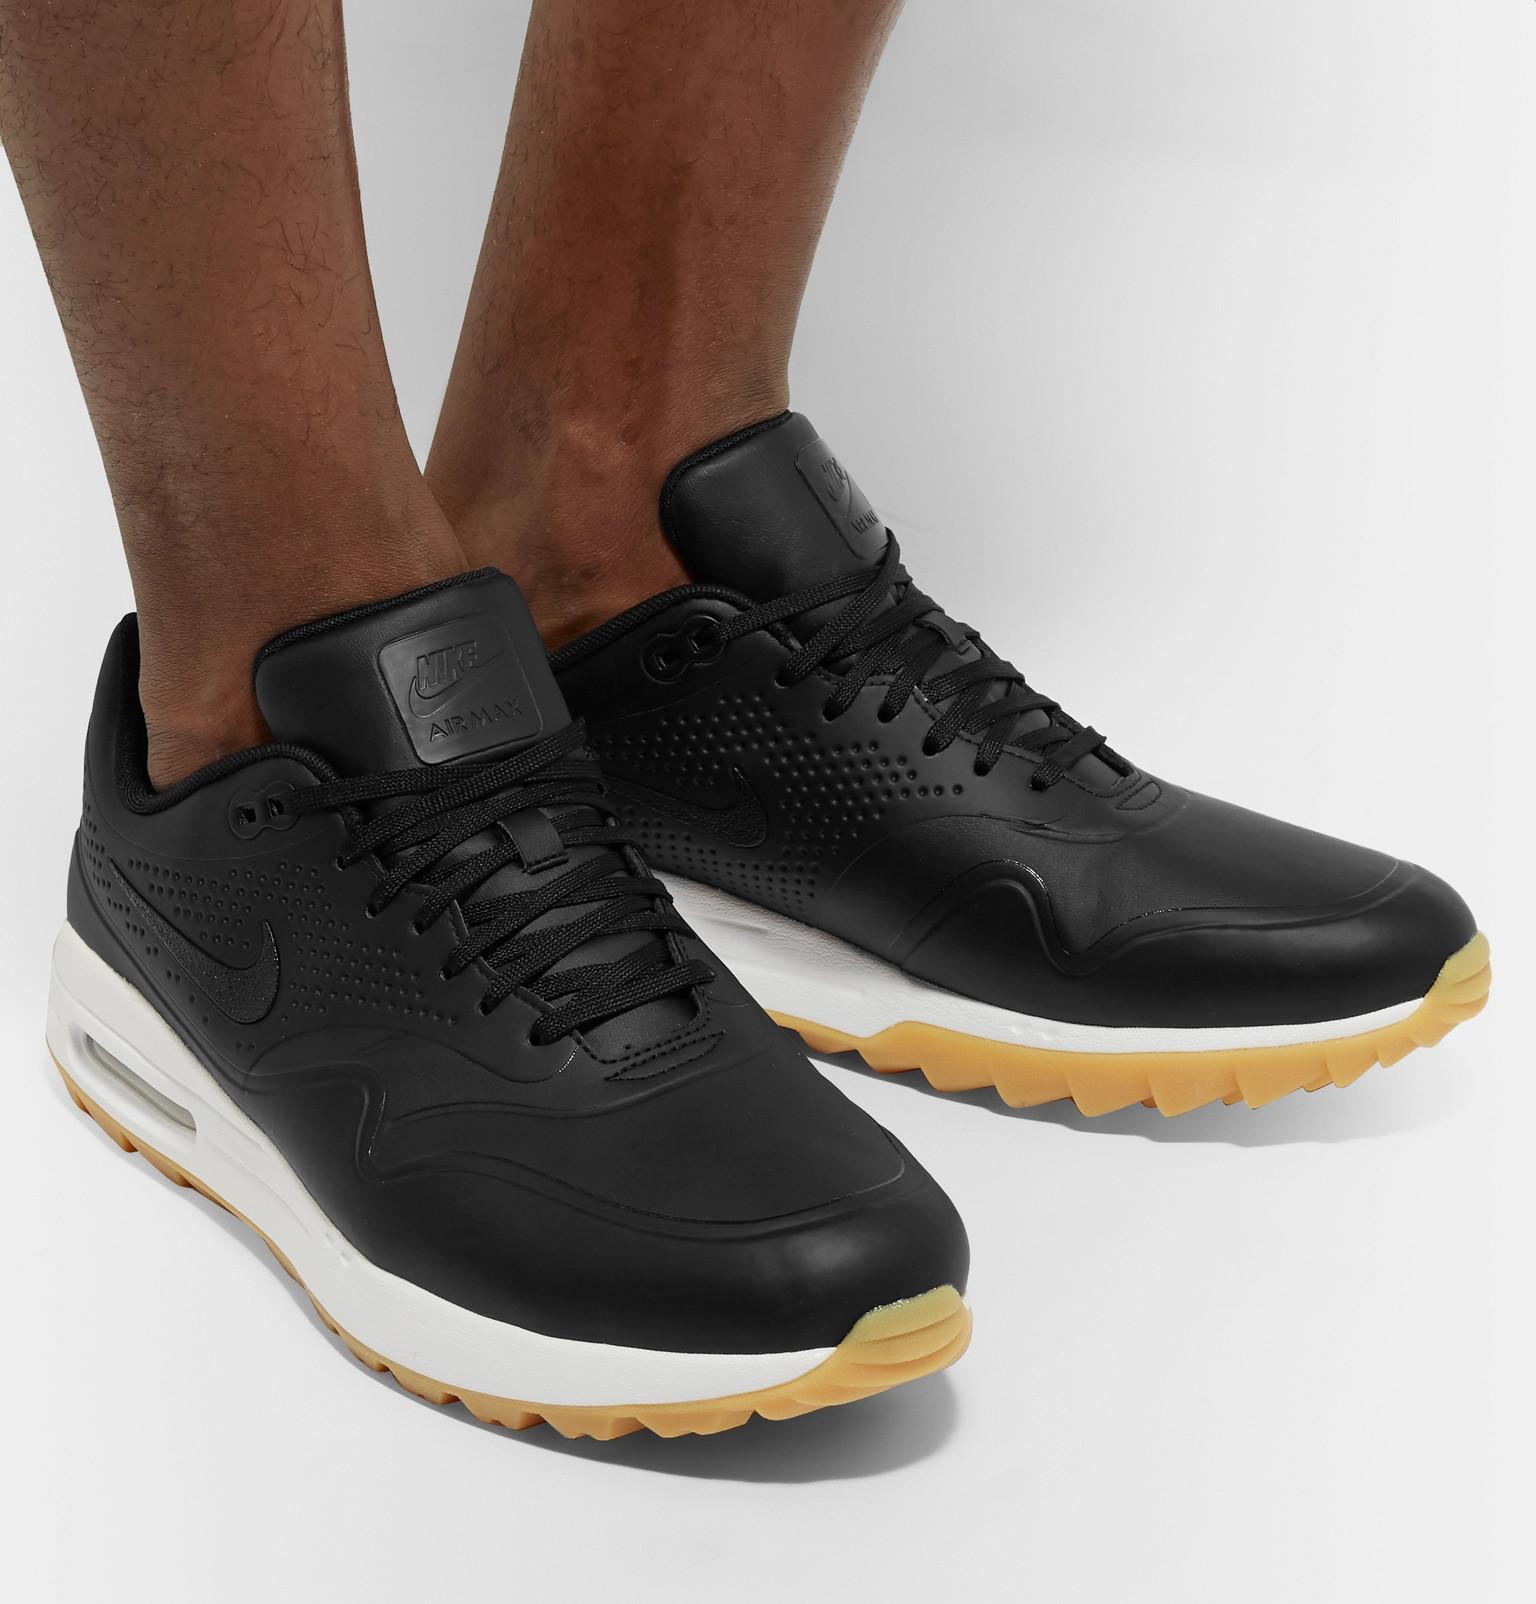 Foroffice Nike Men S Air Max 1g Golf Shoes